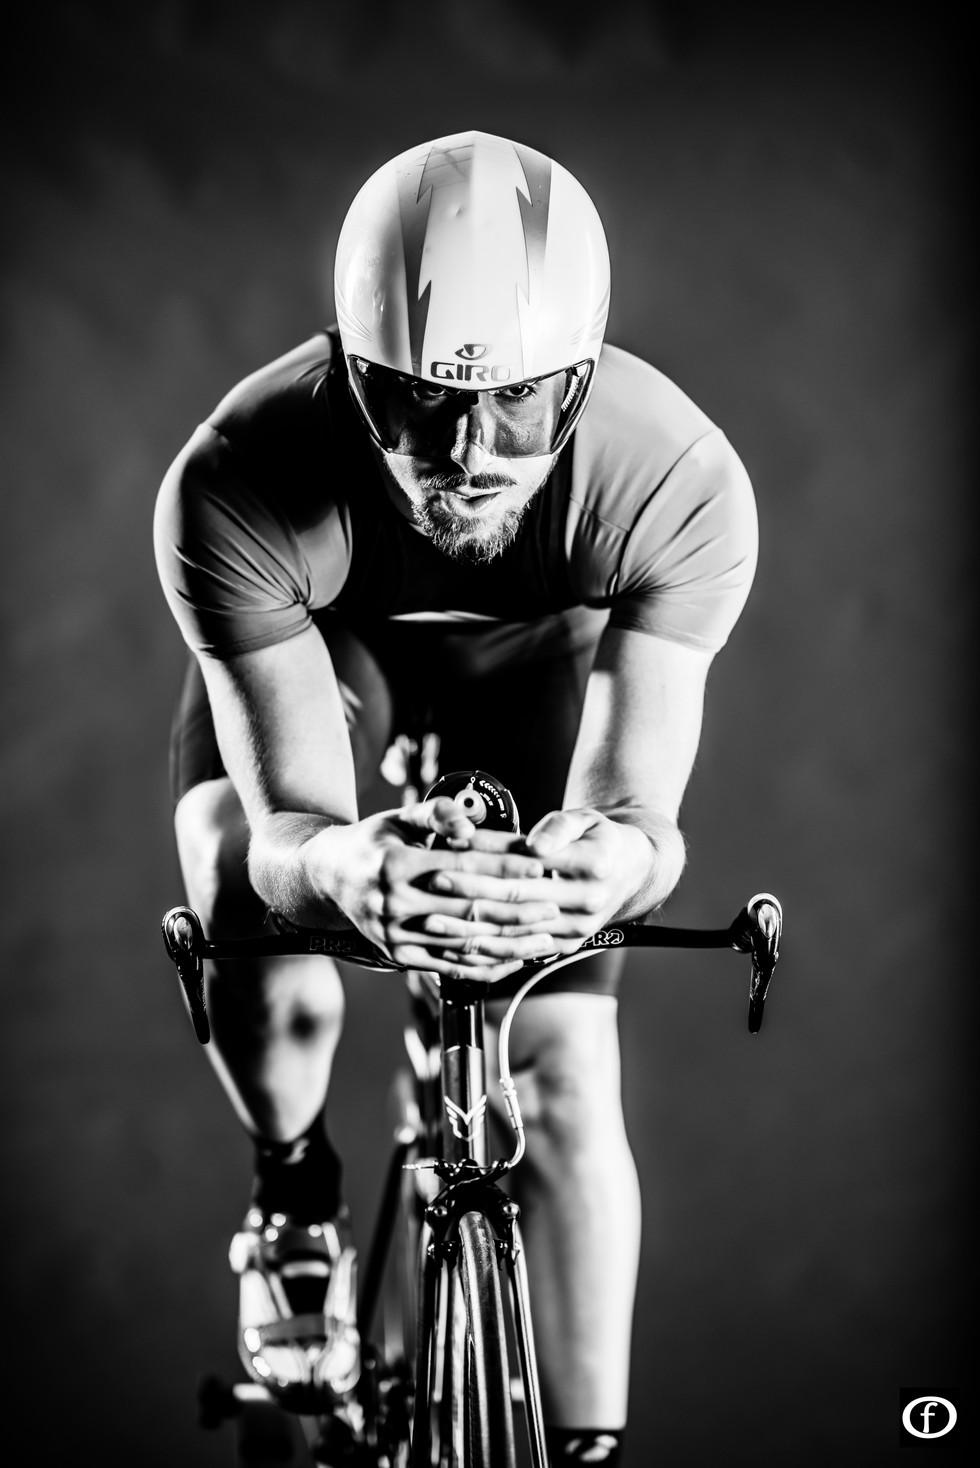 Triatleta Felipe Aguayo-9213.jpg